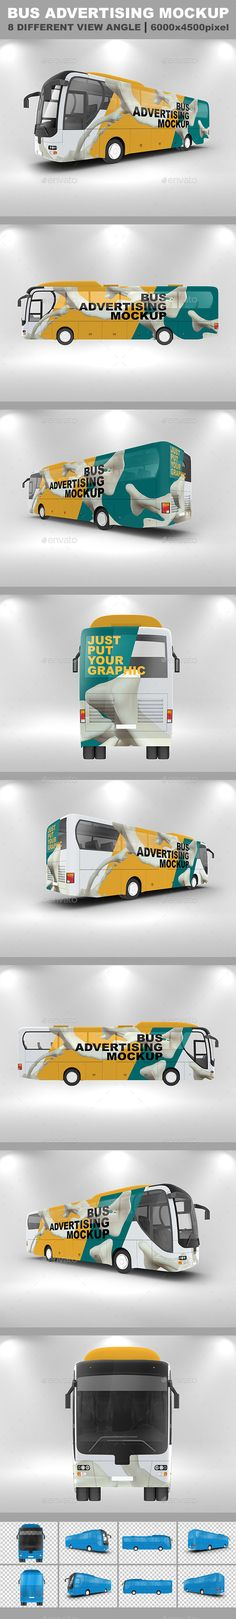 Bus Advertising Mockup Template #mockup #design Download: http://graphicriver.net/item/bus-advertising-mockup/12606783?ref=ksioks